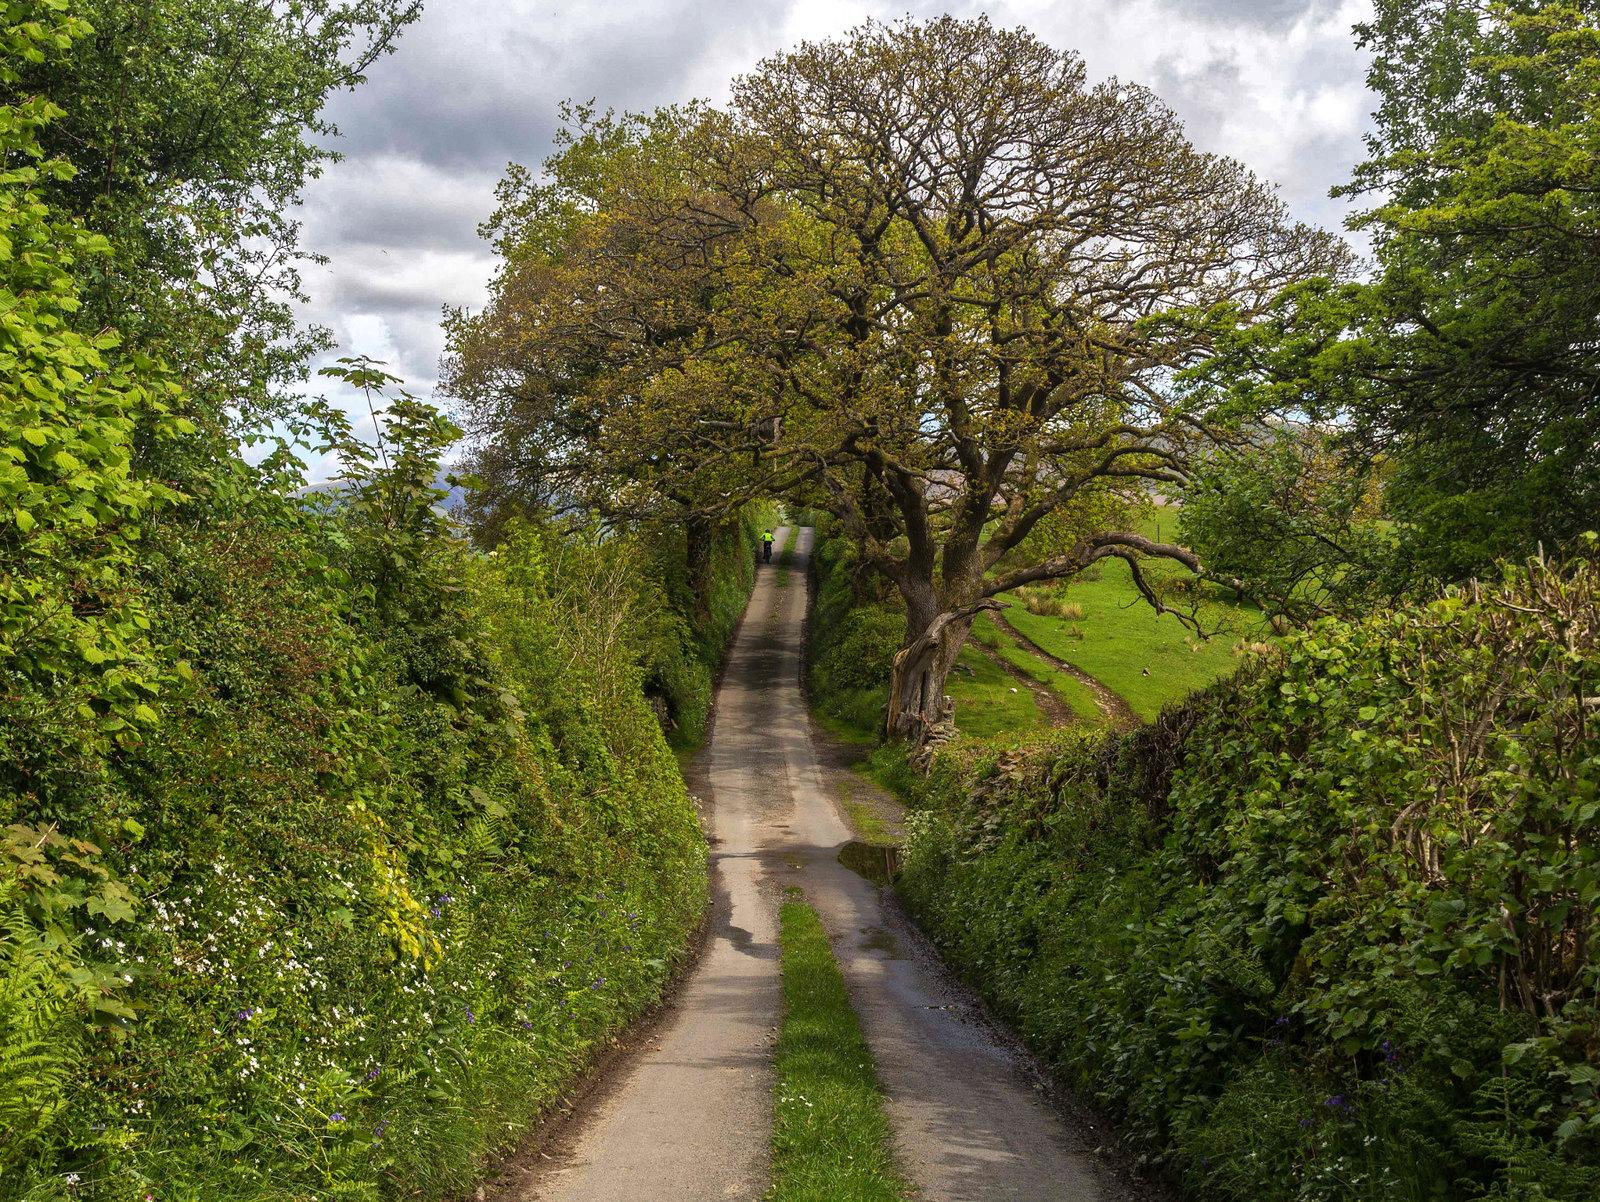 Jordan Lane near Sedbergh, Yorkshire Dales